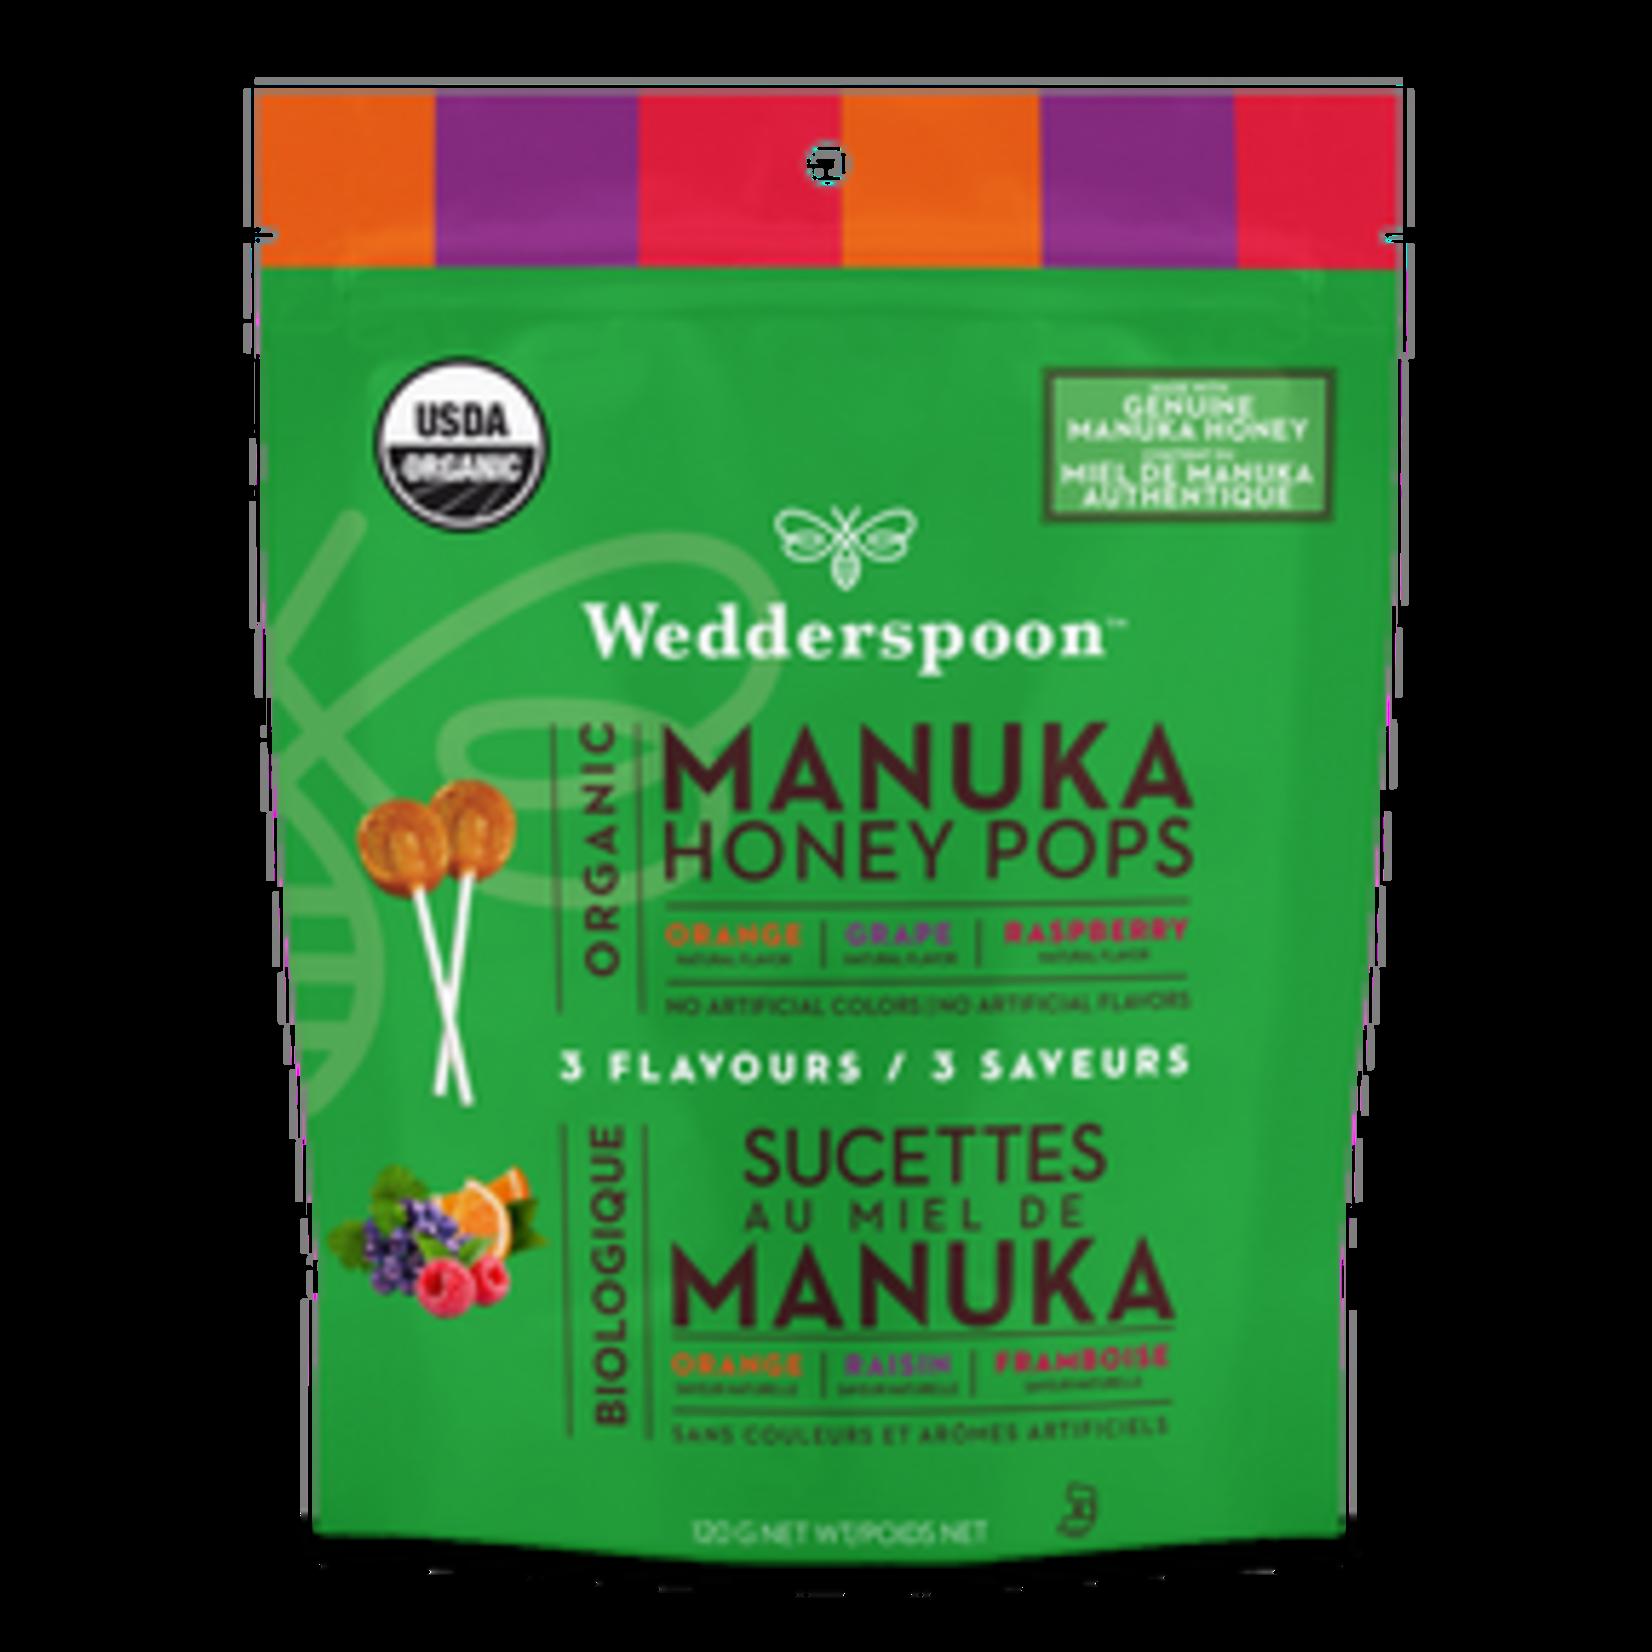 Manuka Honey Pops Organic- 3 flavours